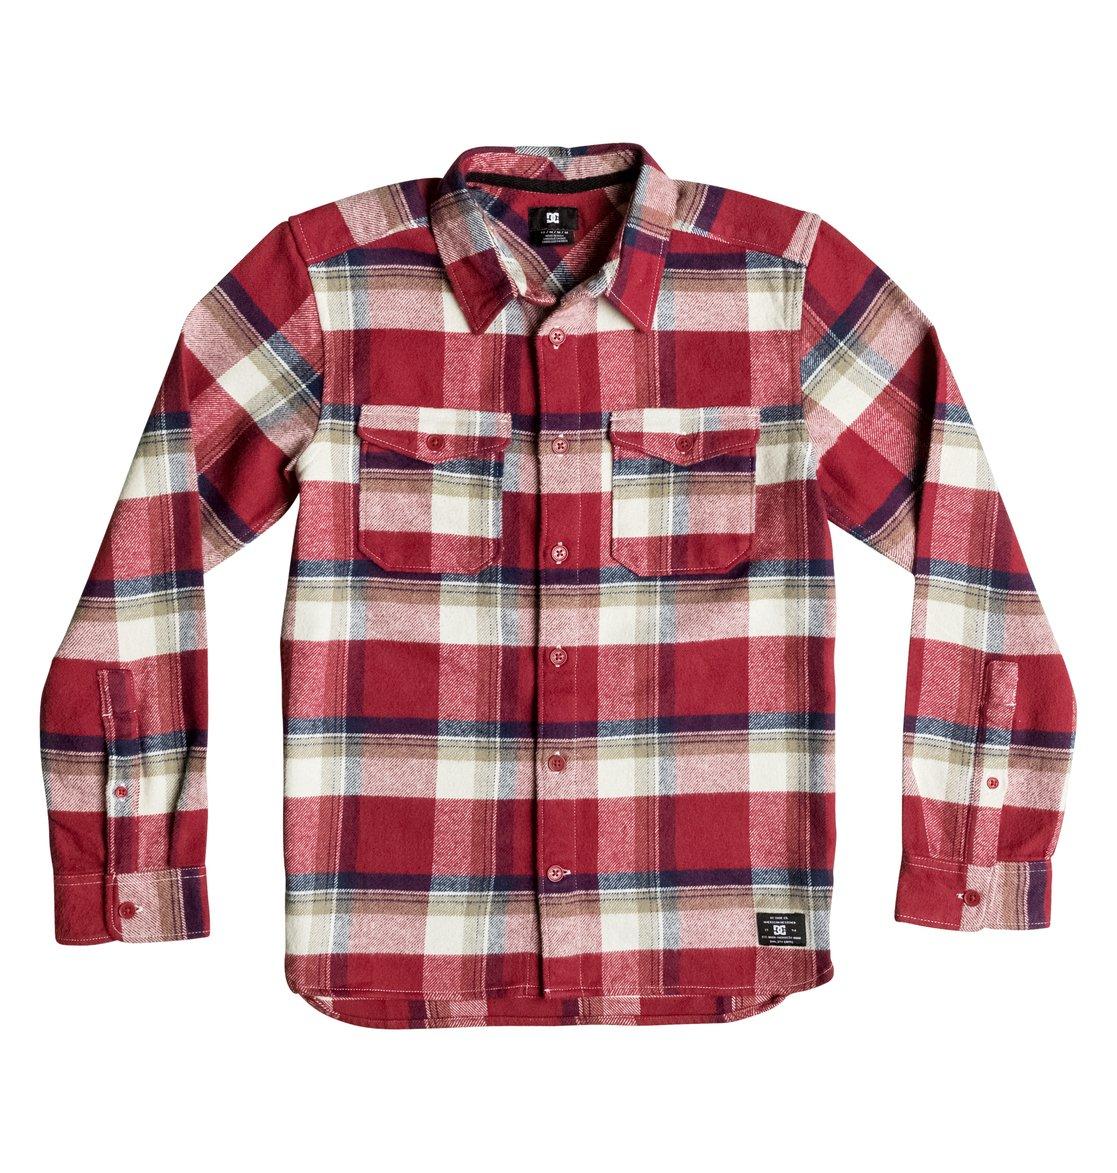 Рубашка Marsha Flannel с длинным рукавом рубашка в клетку dc shoes marsha marsha chili pepper